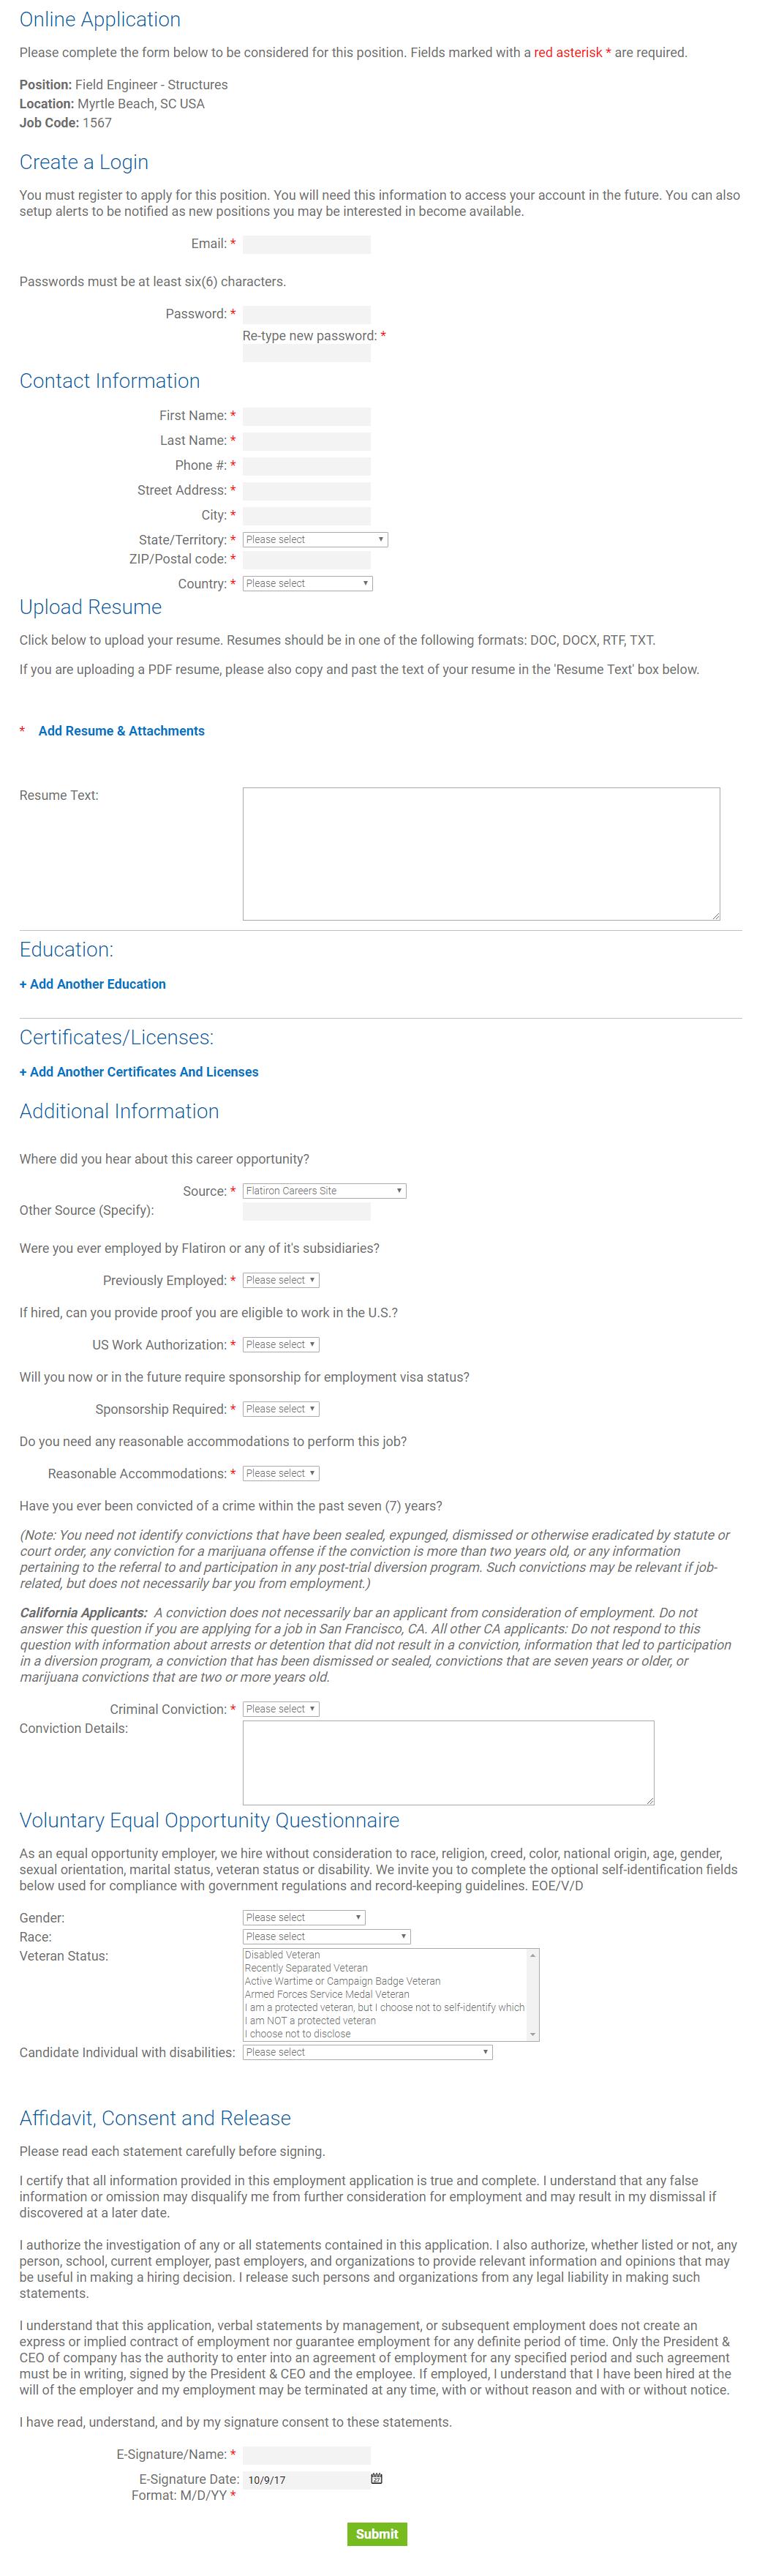 C:\Users\Admin\Downloads\FireShot\Career.png